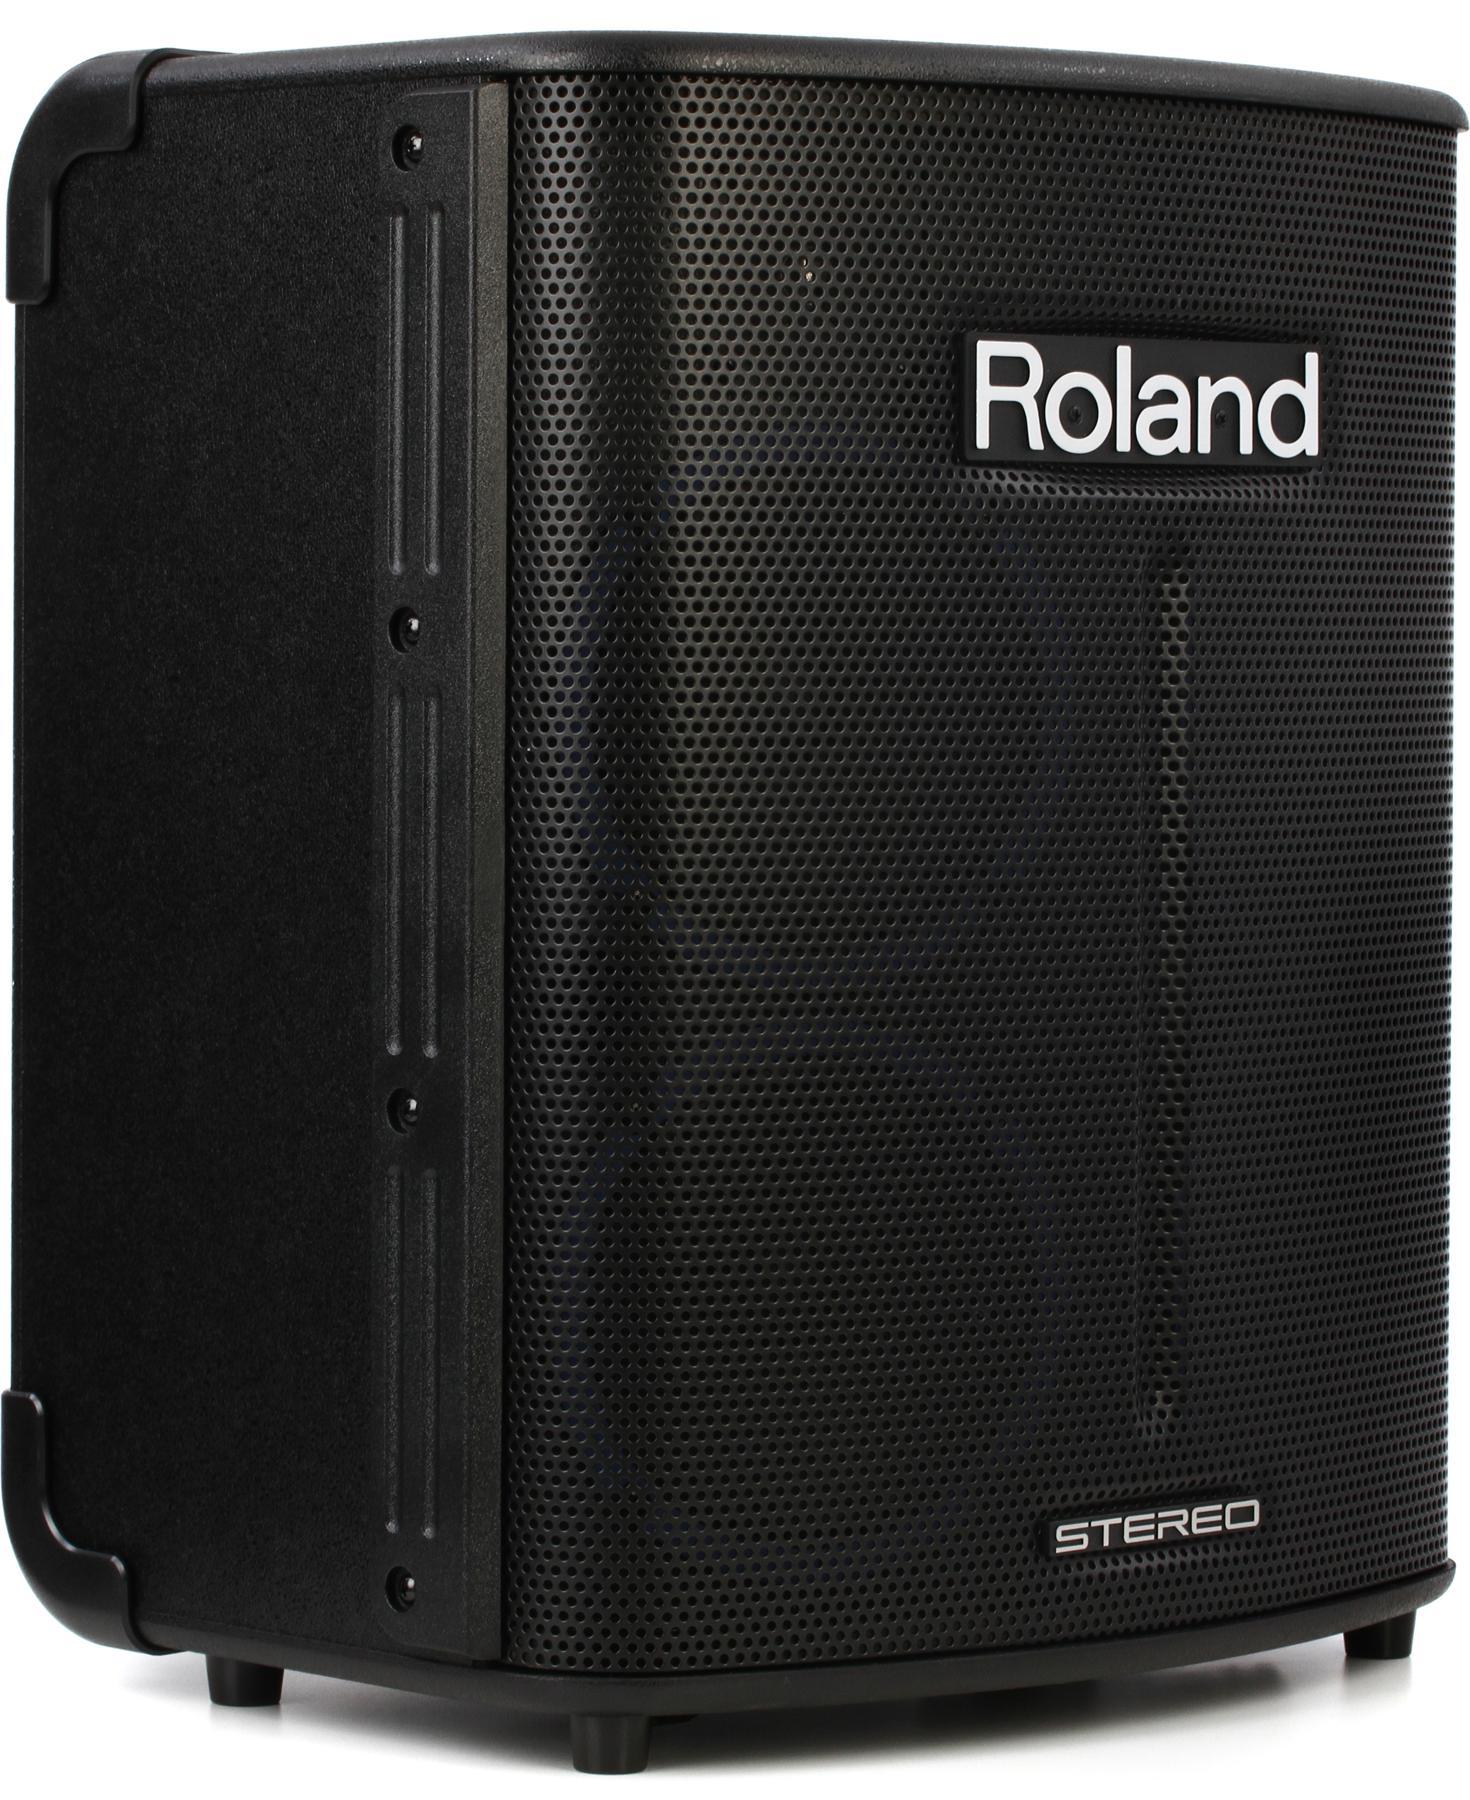 4. Roland BA 330